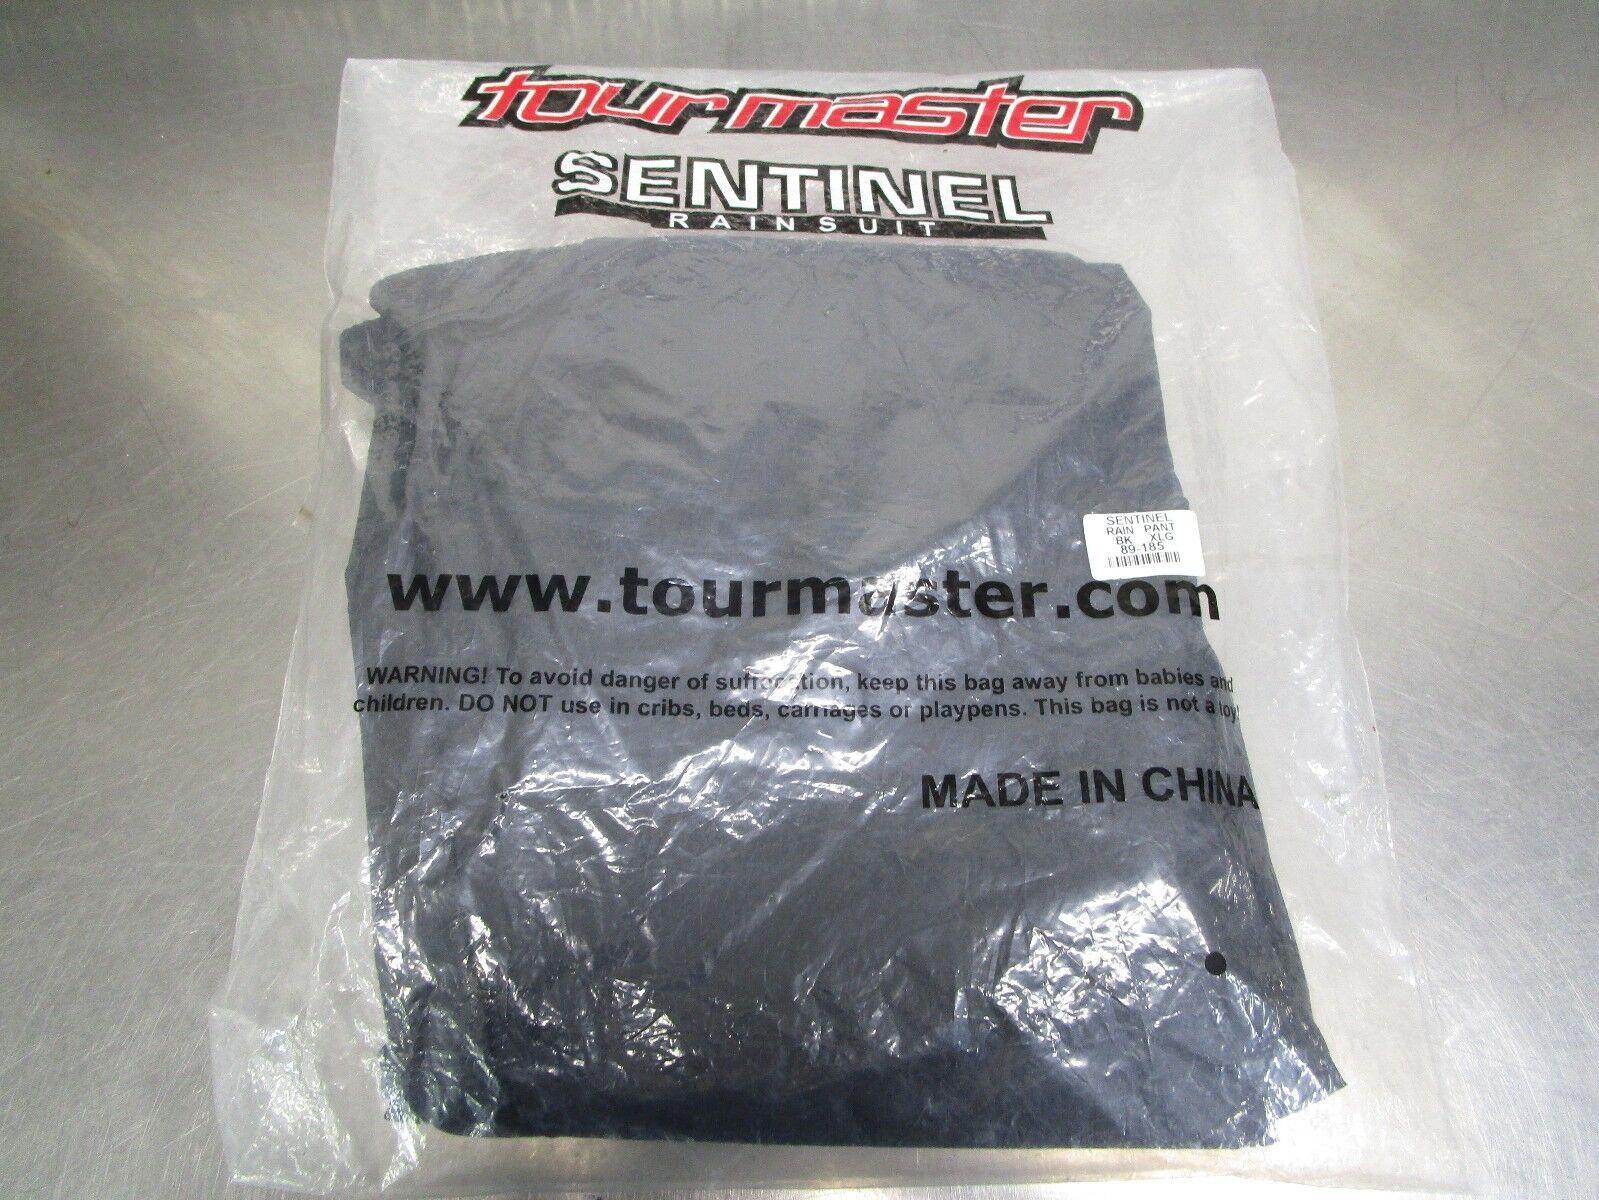 Tourmaster Mens Sentinel LE Motor Officer Rainsuit Jacket 3X-Large